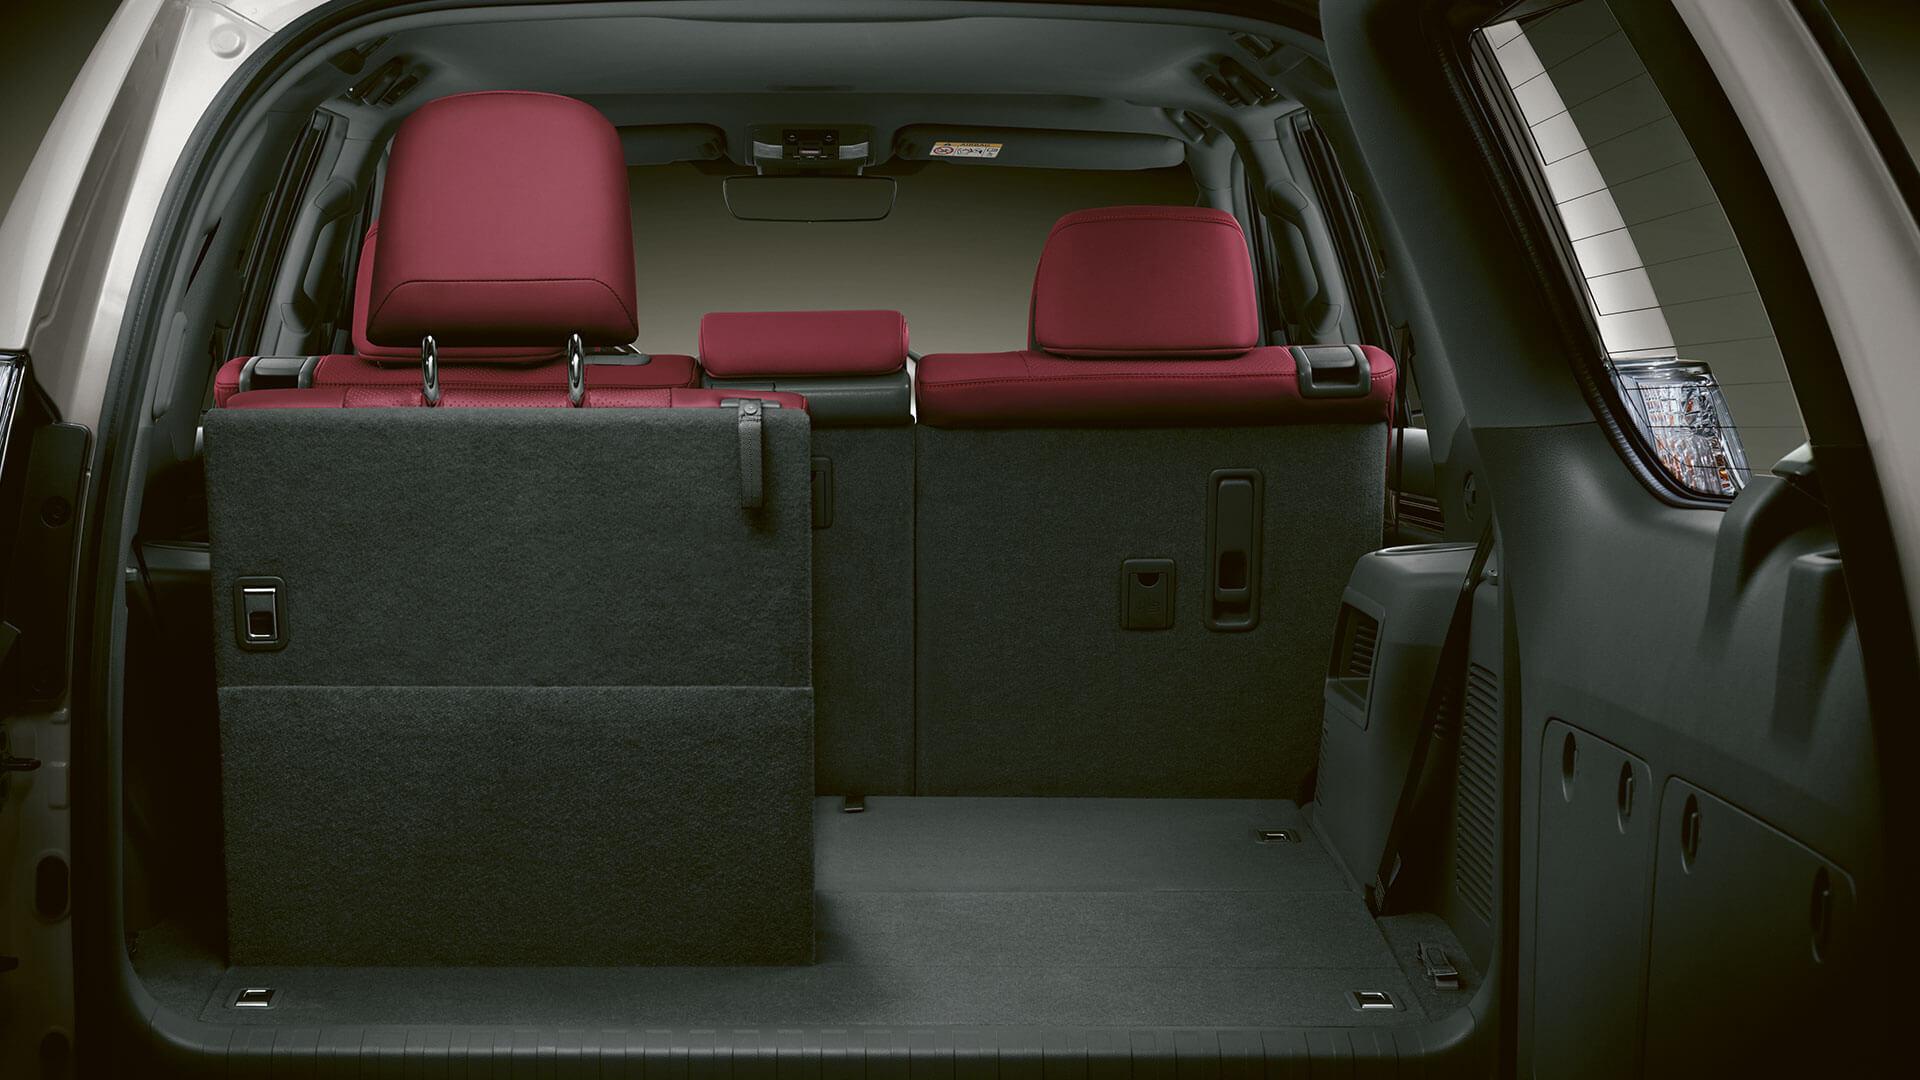 2019 lexus gx hotspot five seat version